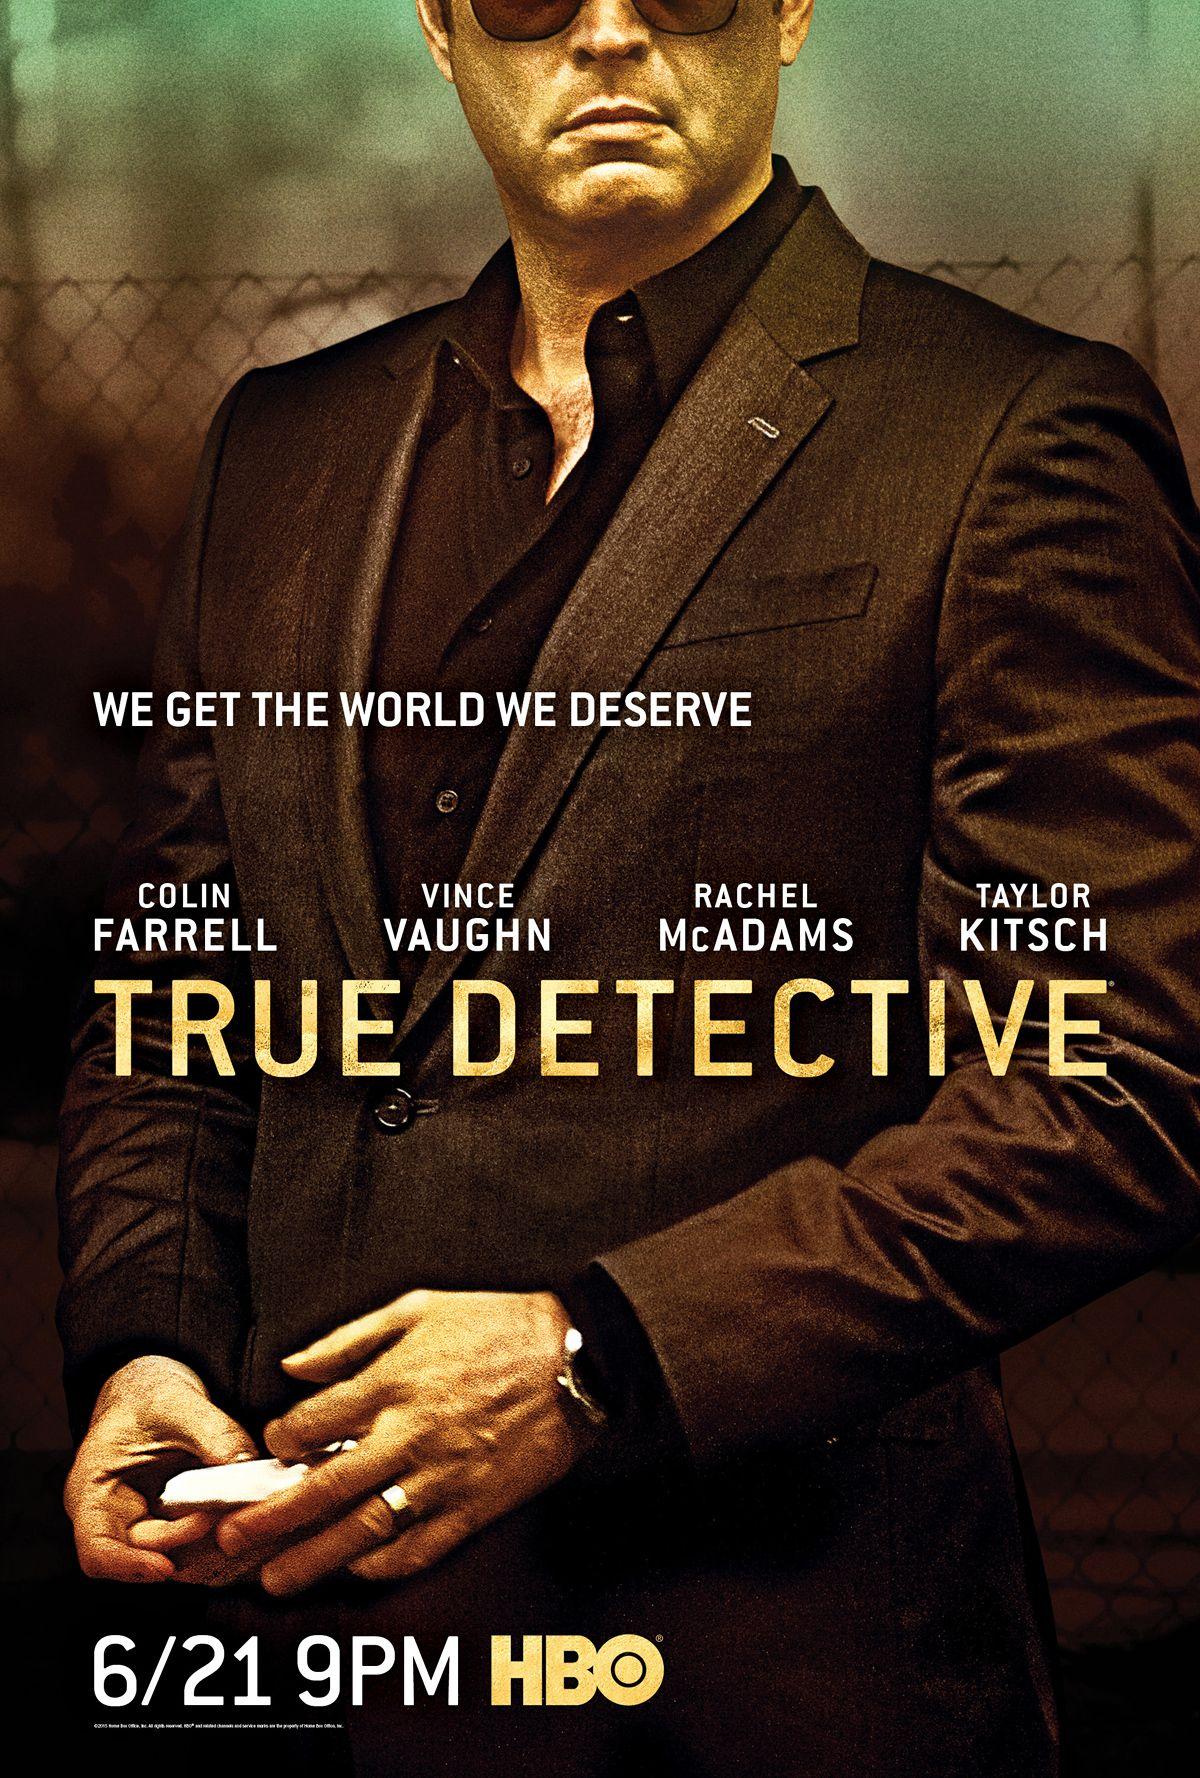 true detective season 2 vince vaughn poster